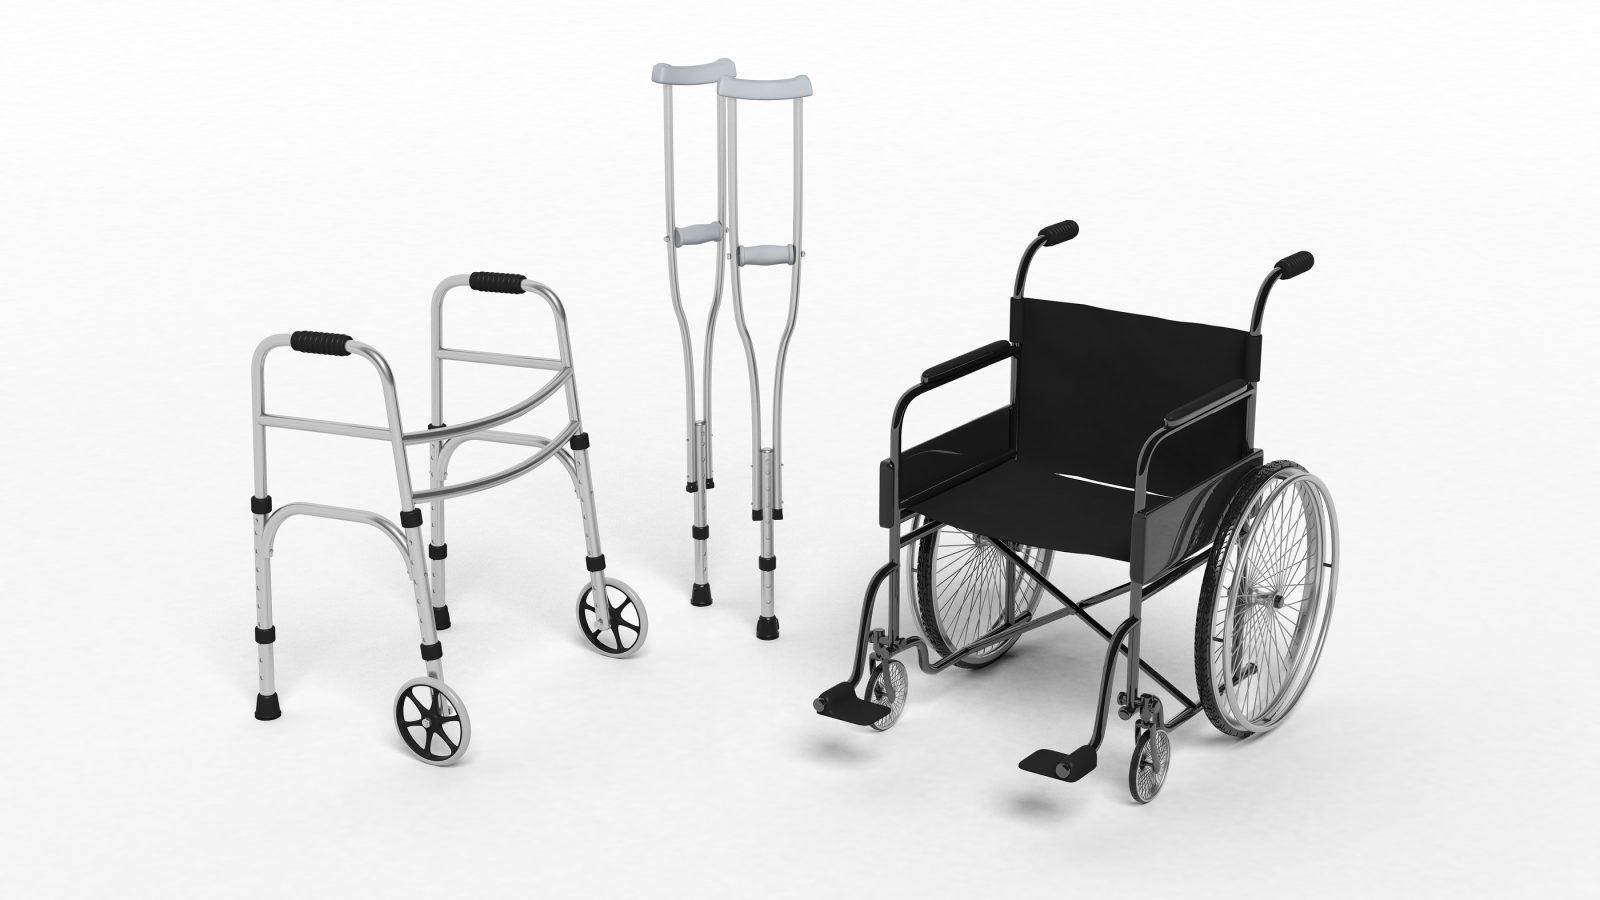 Black disability wheelchair, crutch and metallic walker